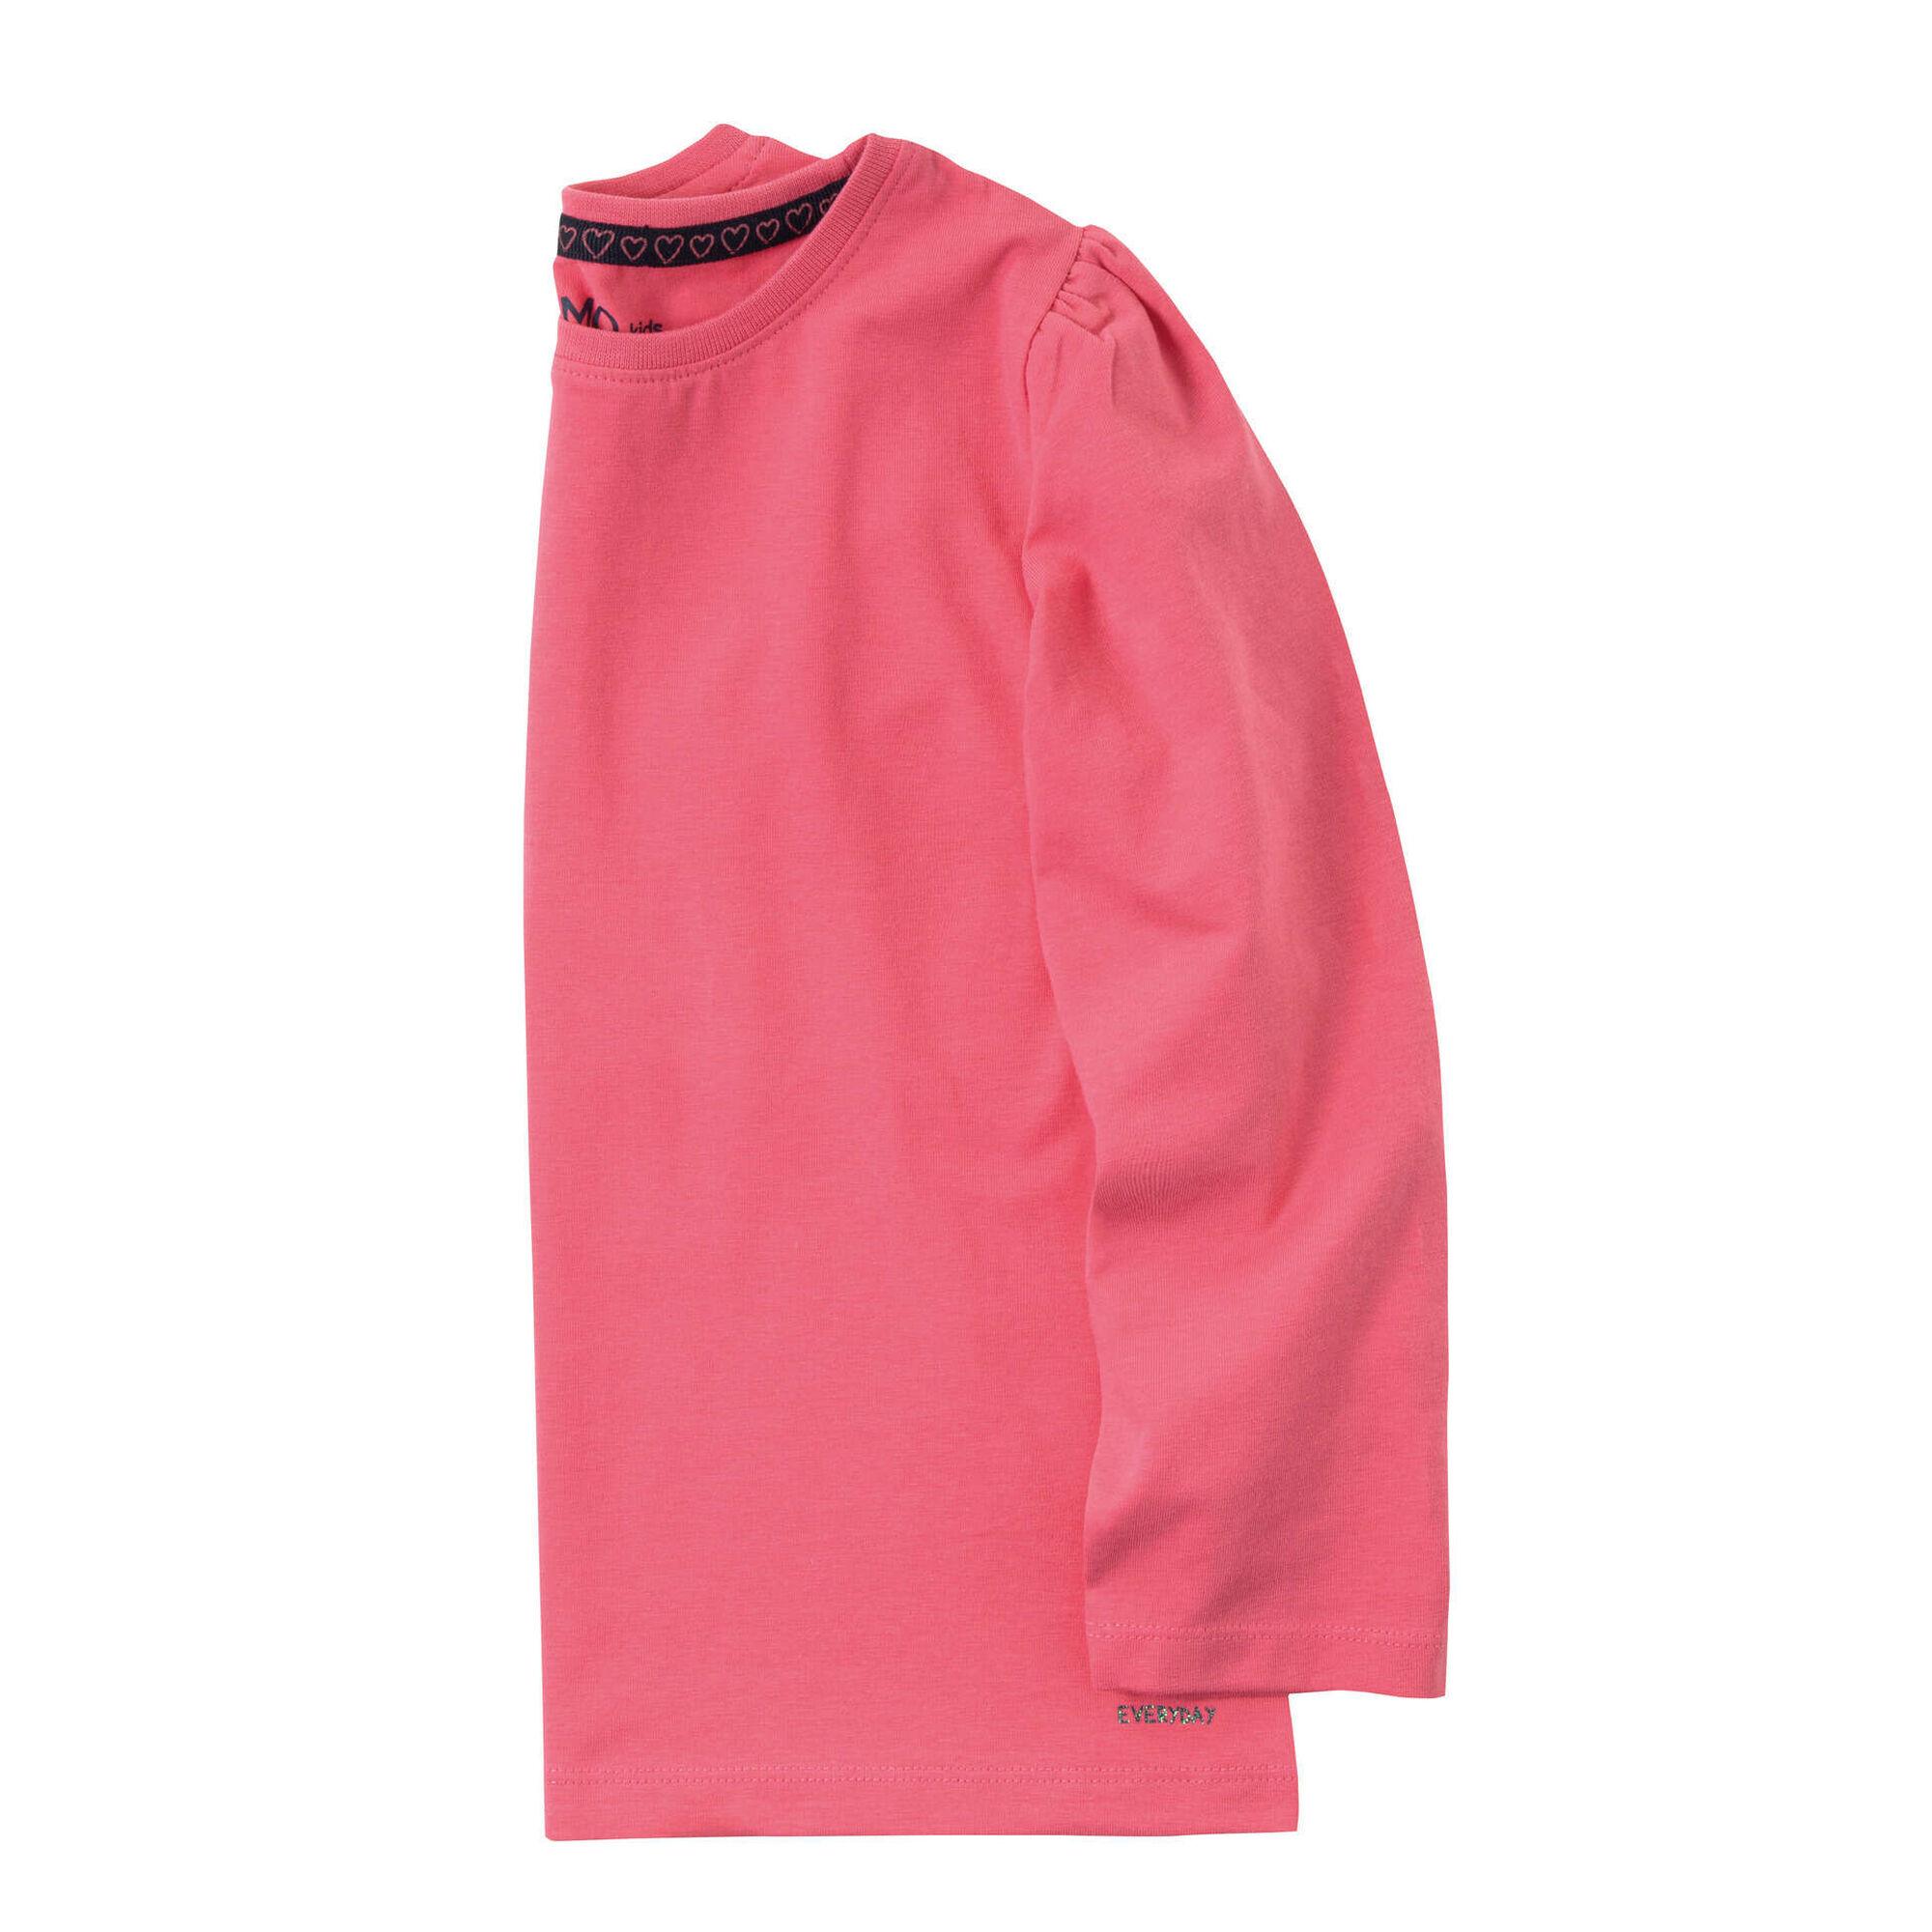 T-shirt Manga Comprida Rosa